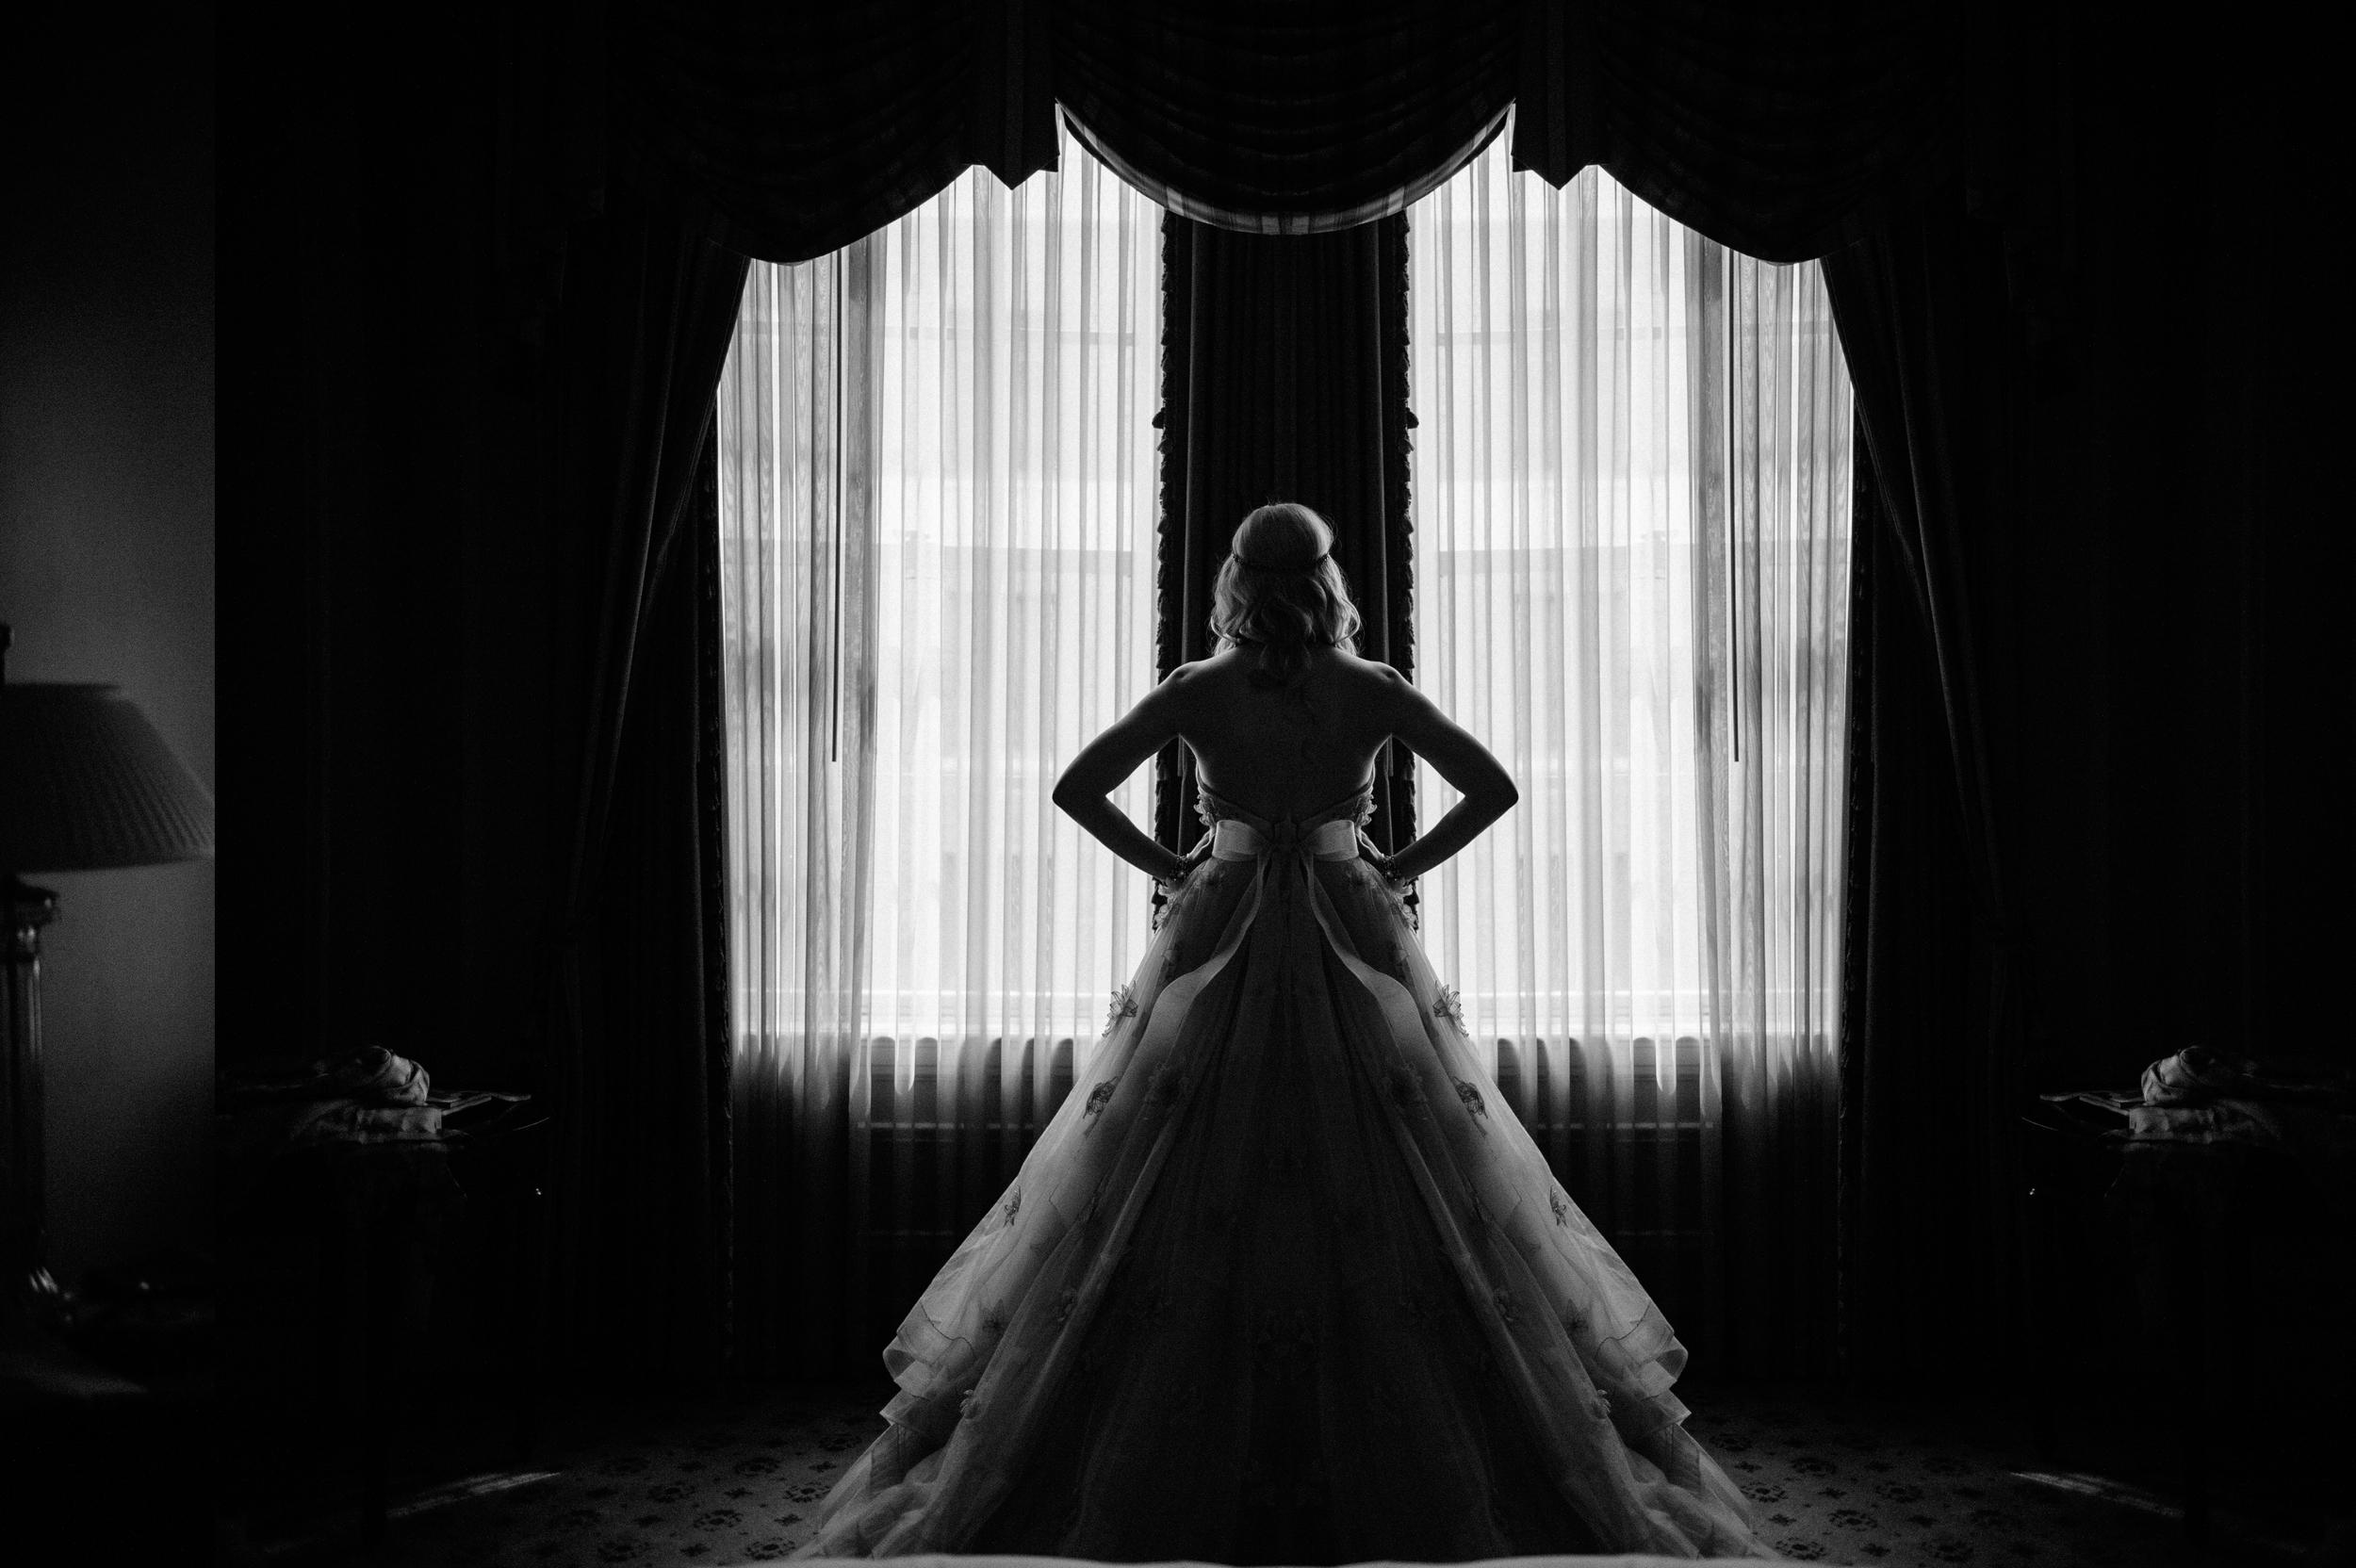 cicada_los_angeles_wedding_photography_0019.jpg